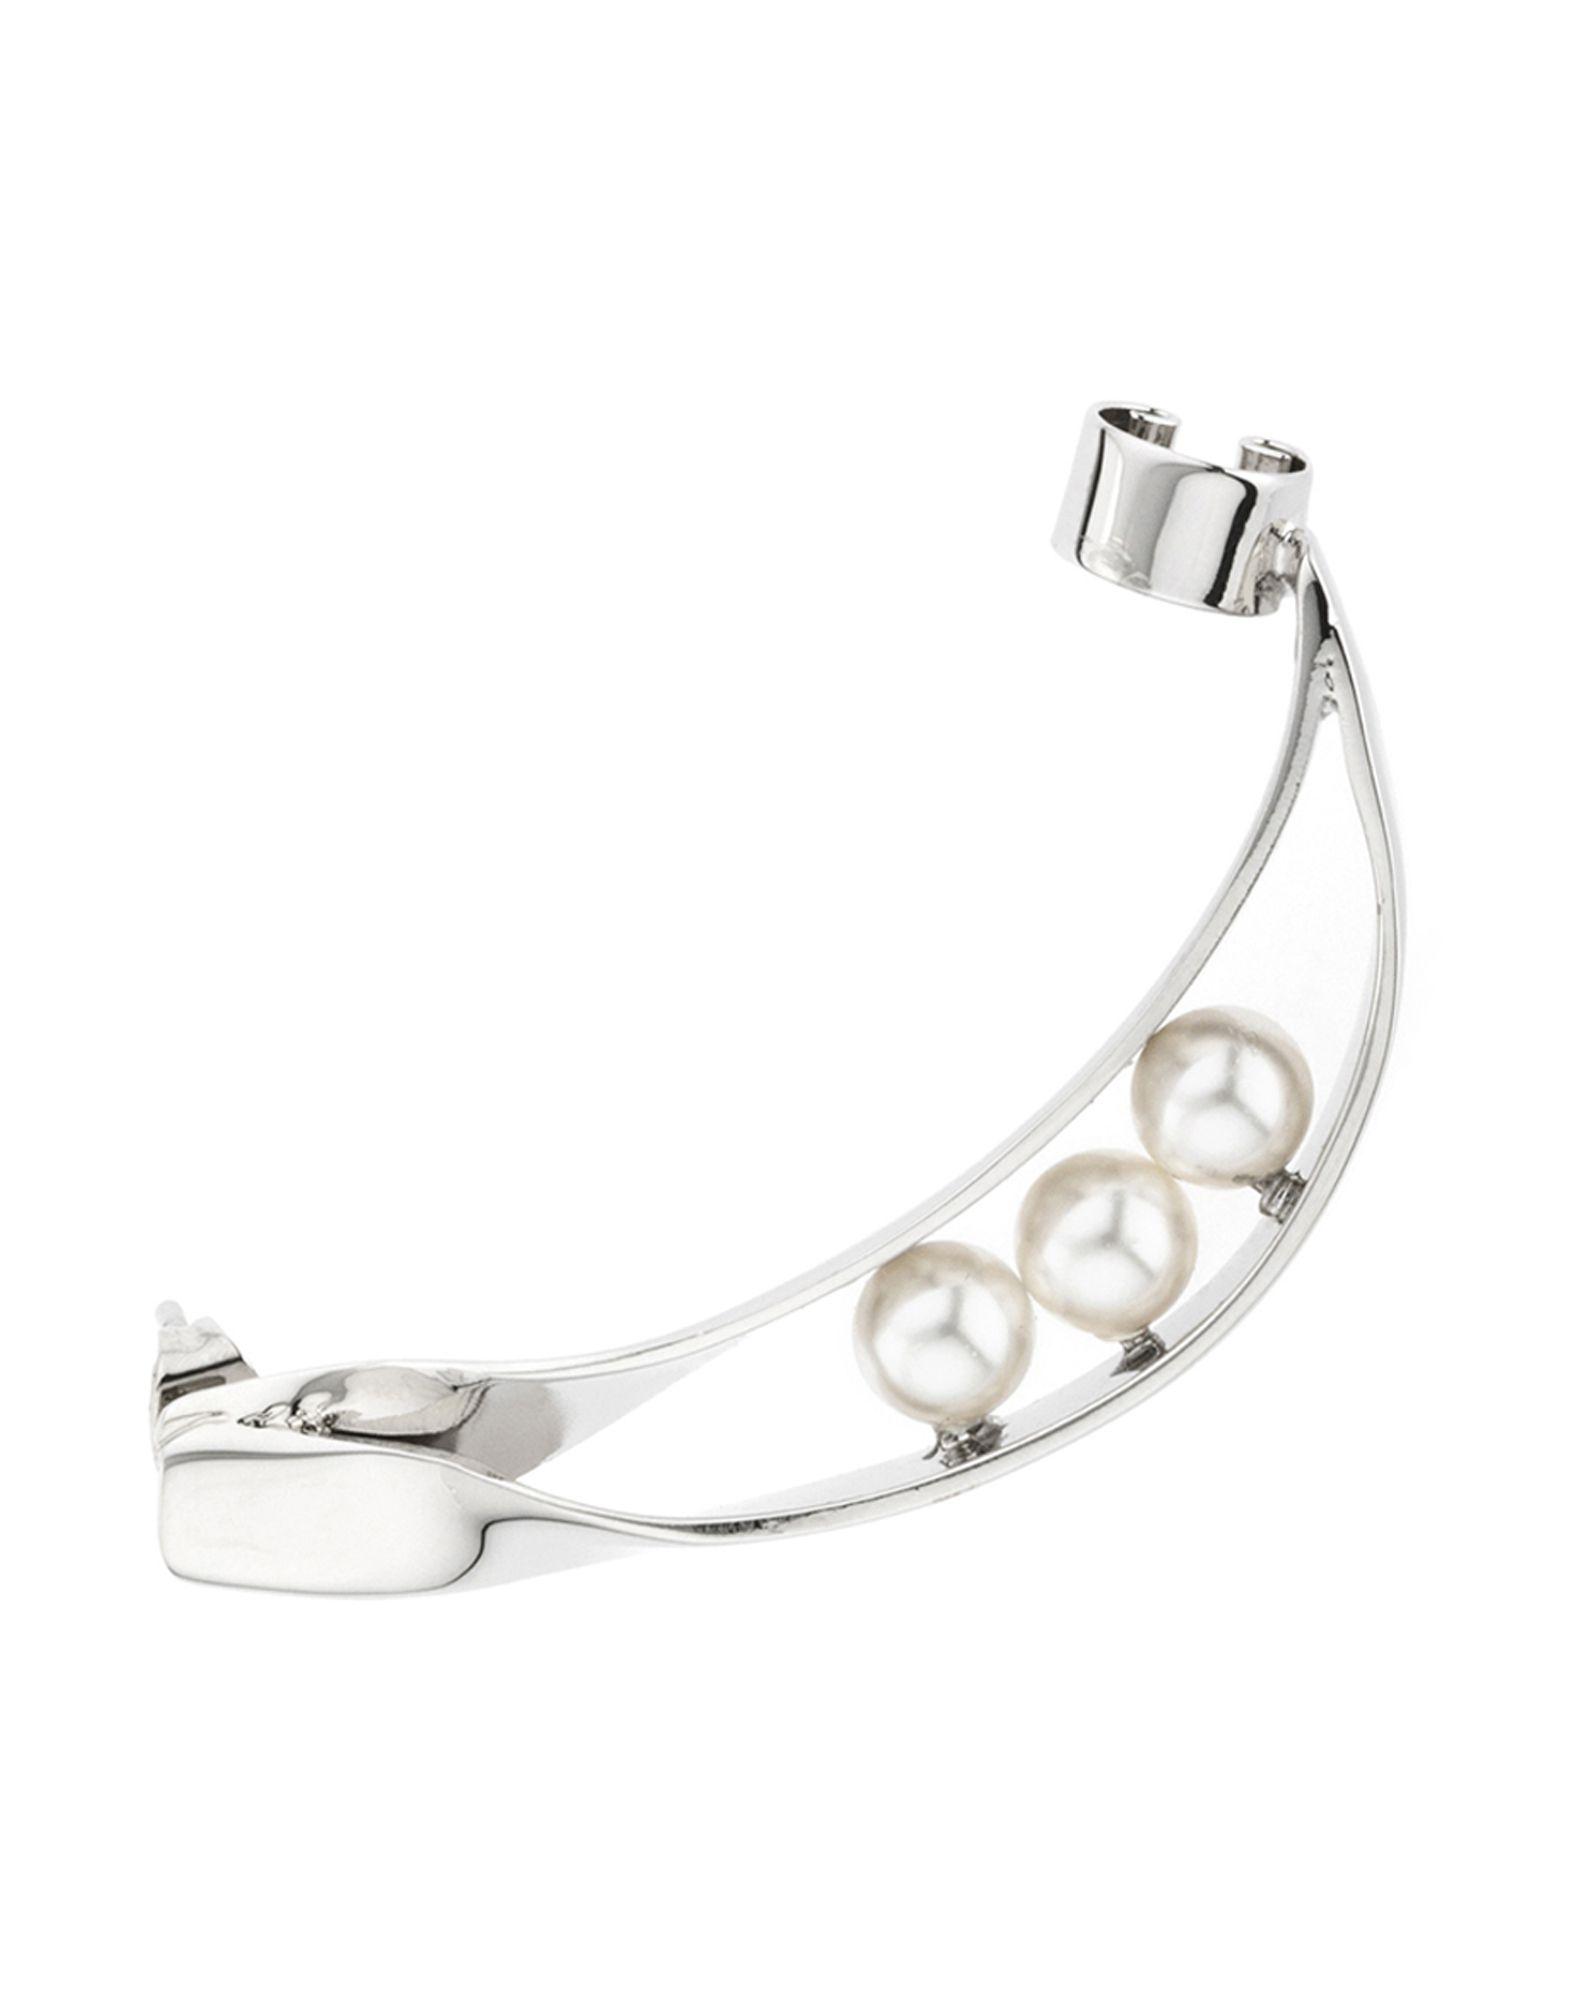 SHARRA PAGANO Earring in Silver